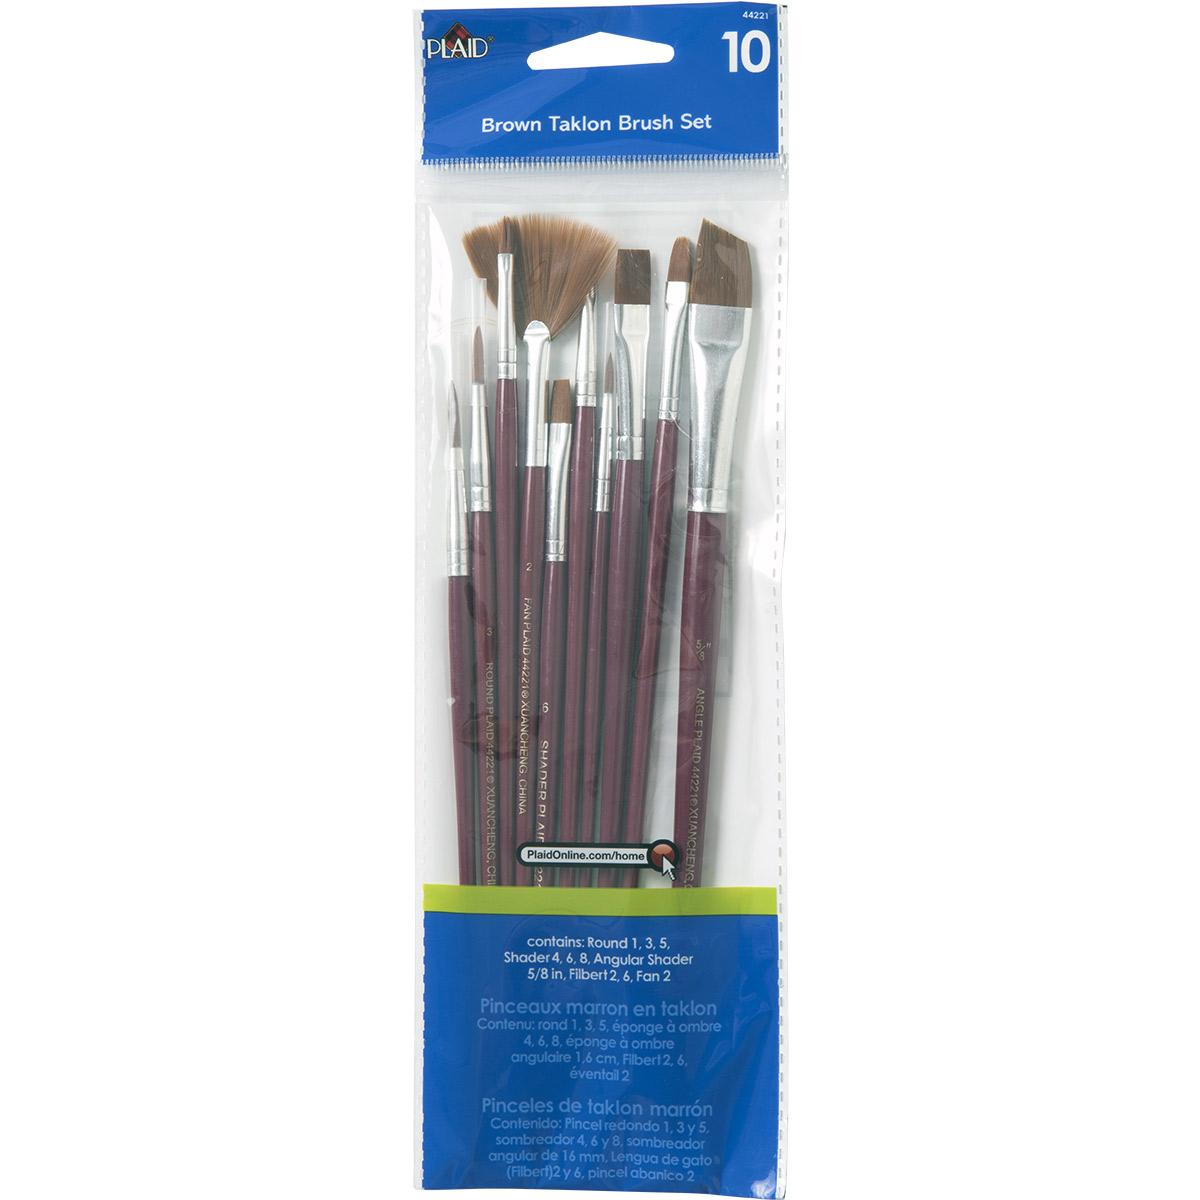 Plaid ® Brush Sets - Wood Brush Set, Brown Nylon